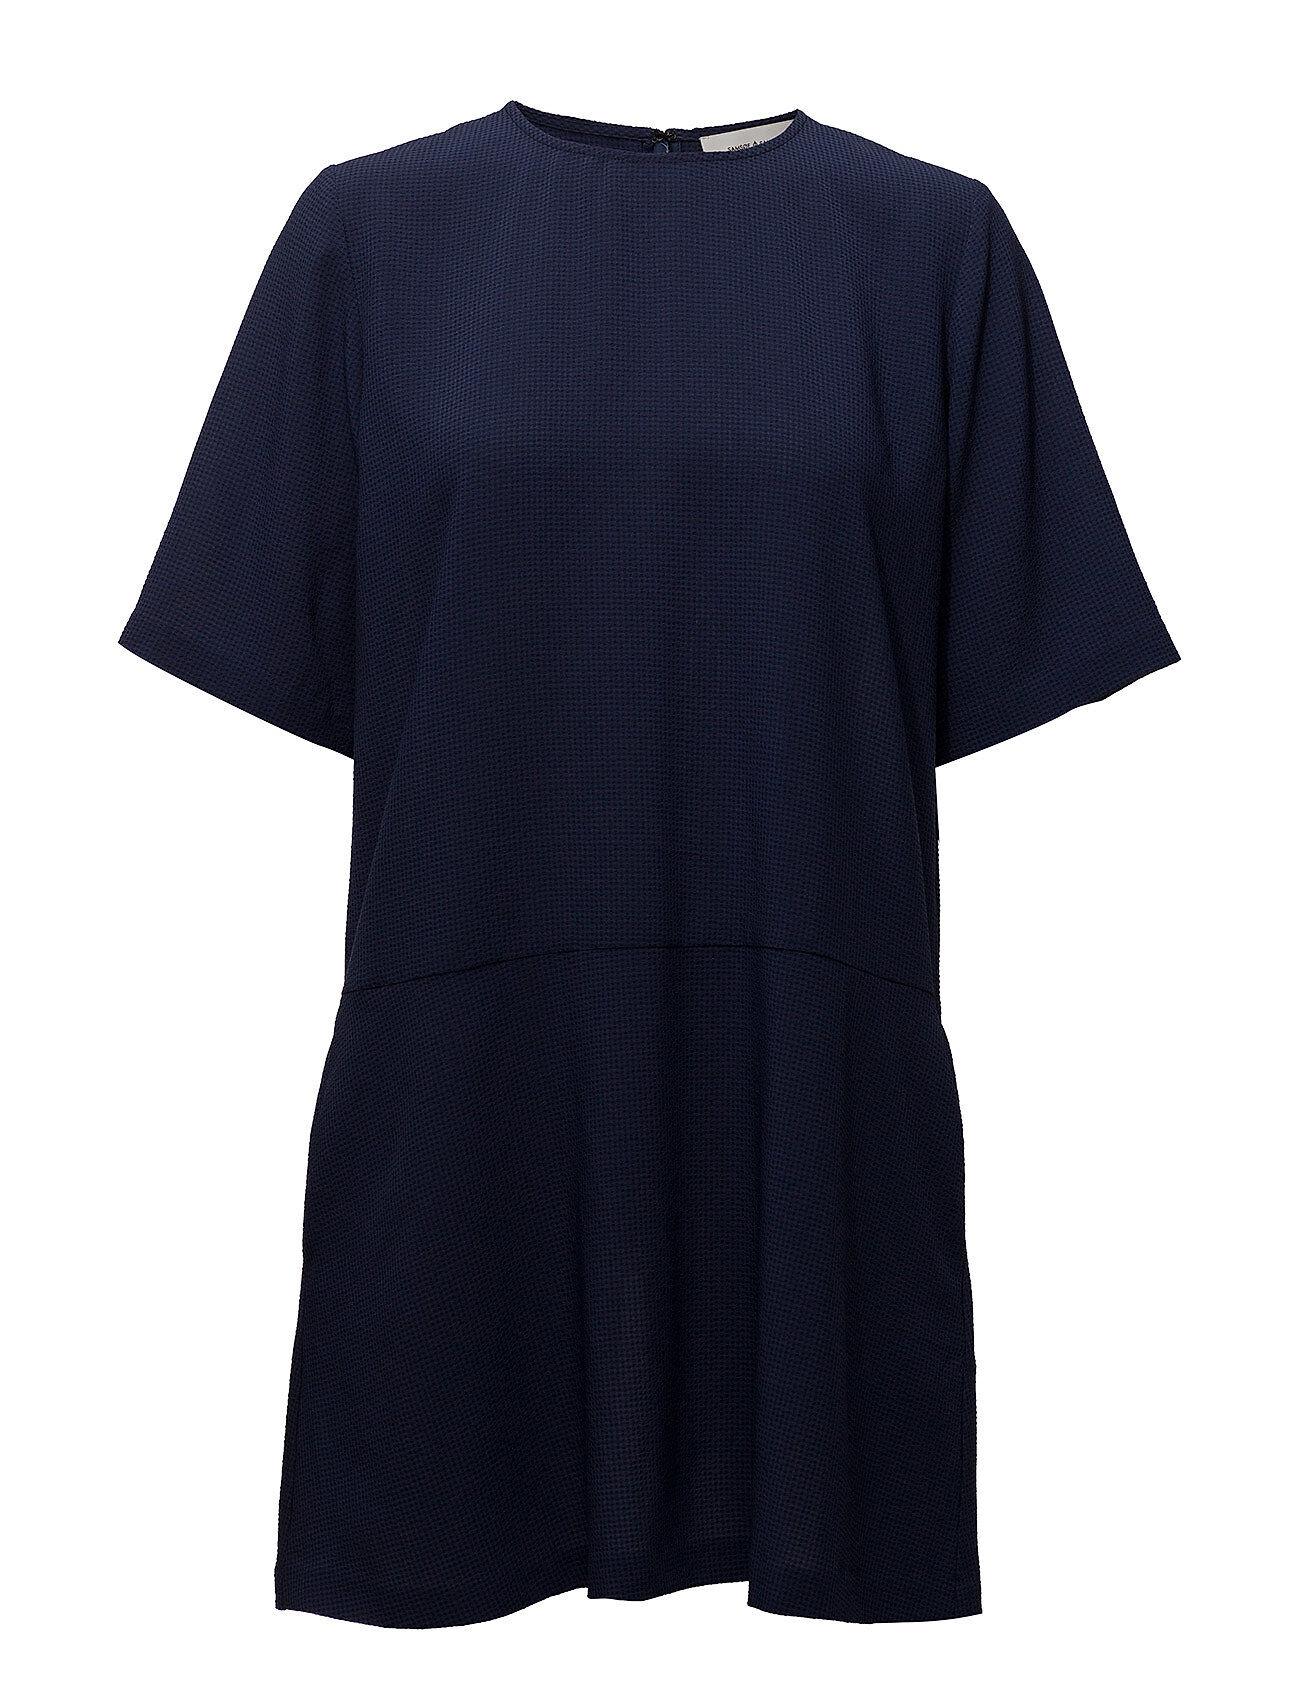 Samsøe & Samsøe Adelaide Dress 9956